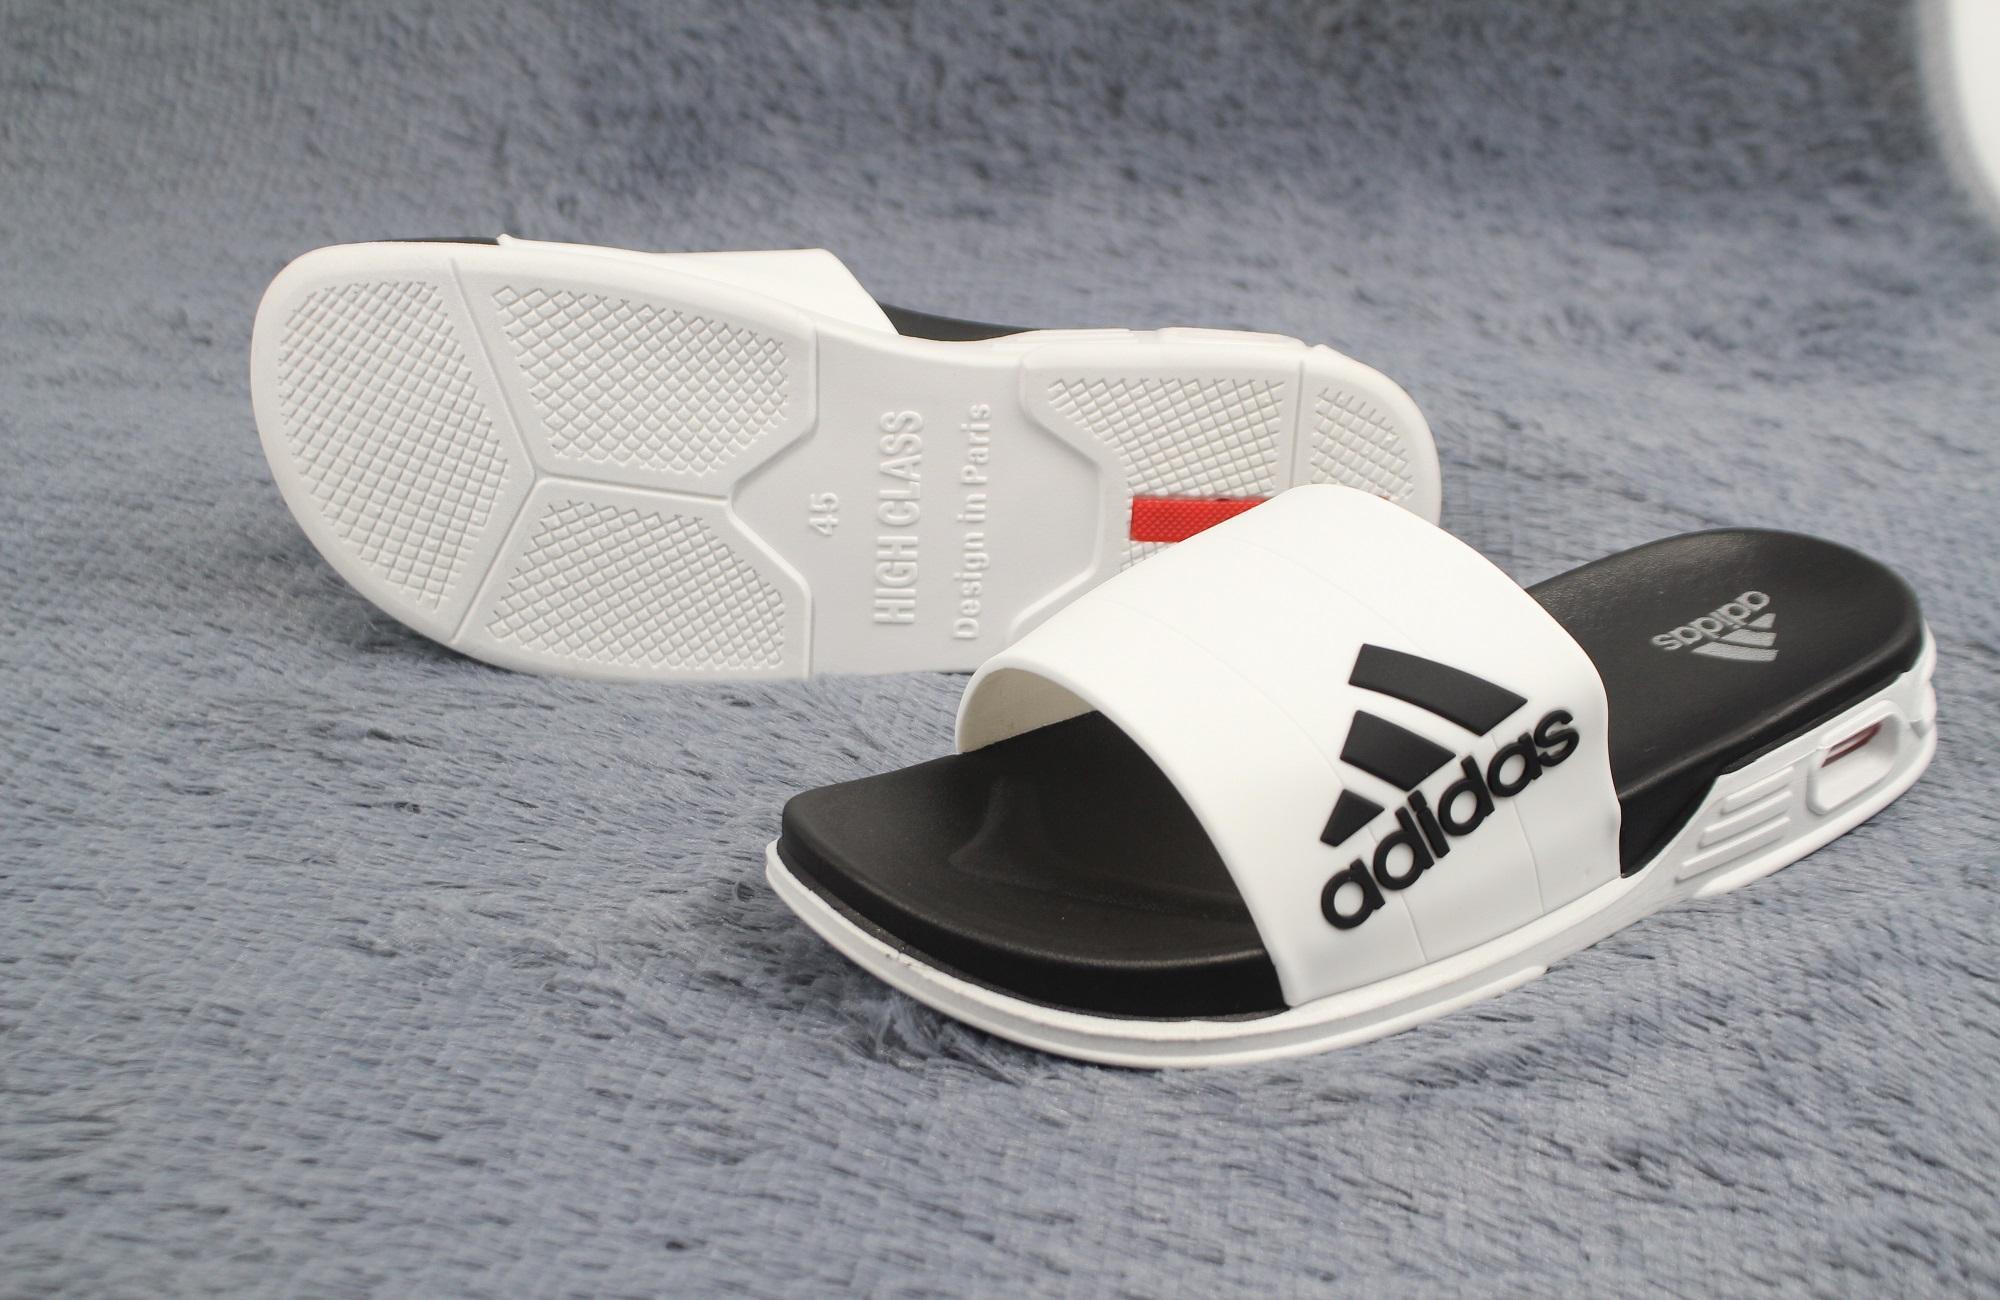 270e2639530 Flip Flops for Men for sale - Mens Flip Flops online brands